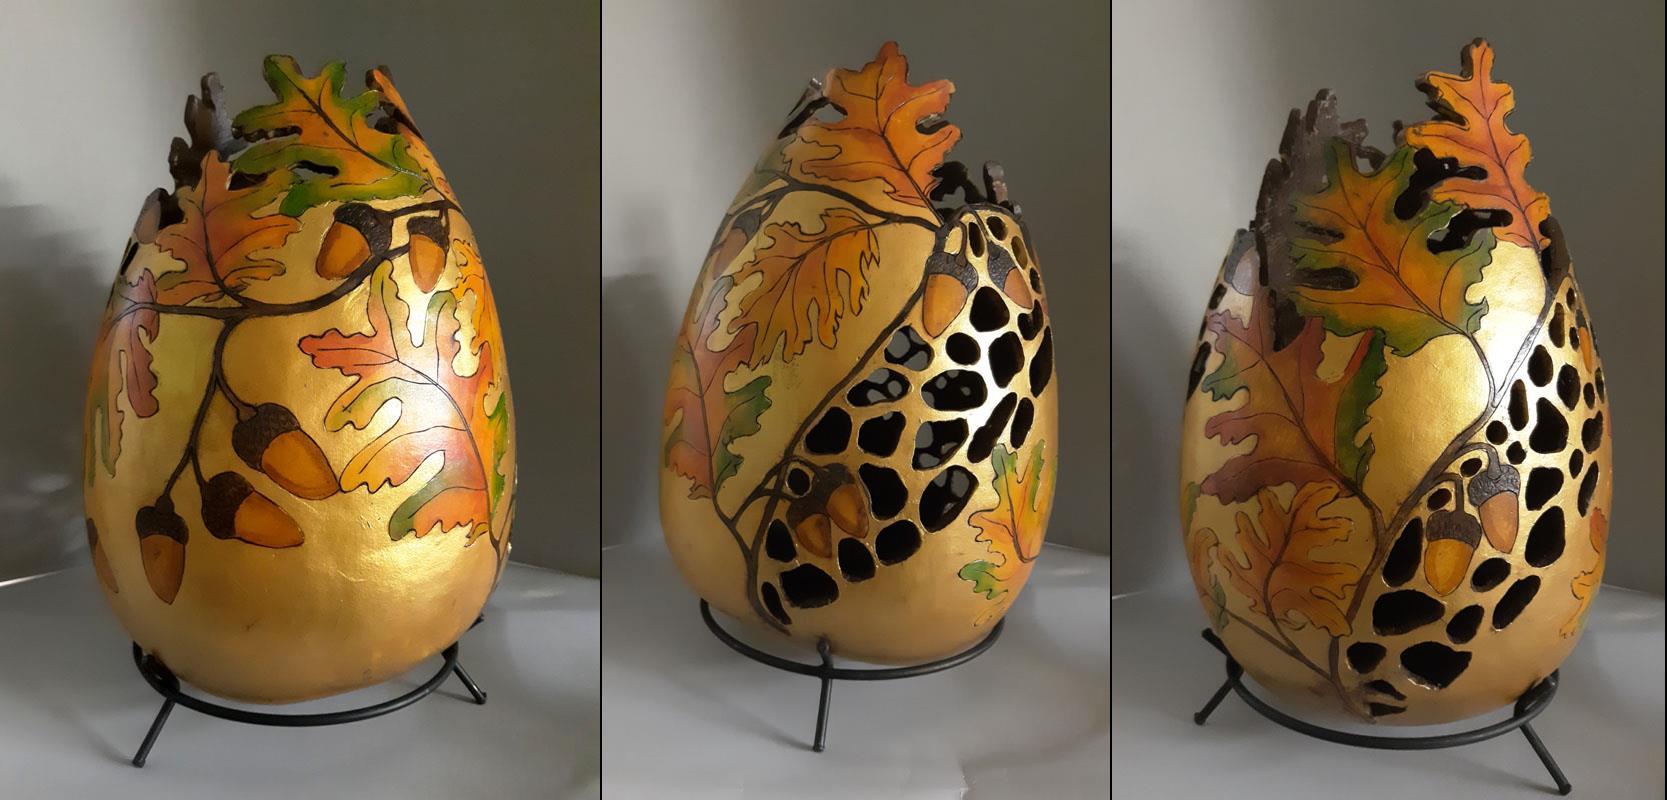 Oak Leaves and Acorns, Gretchen Lee